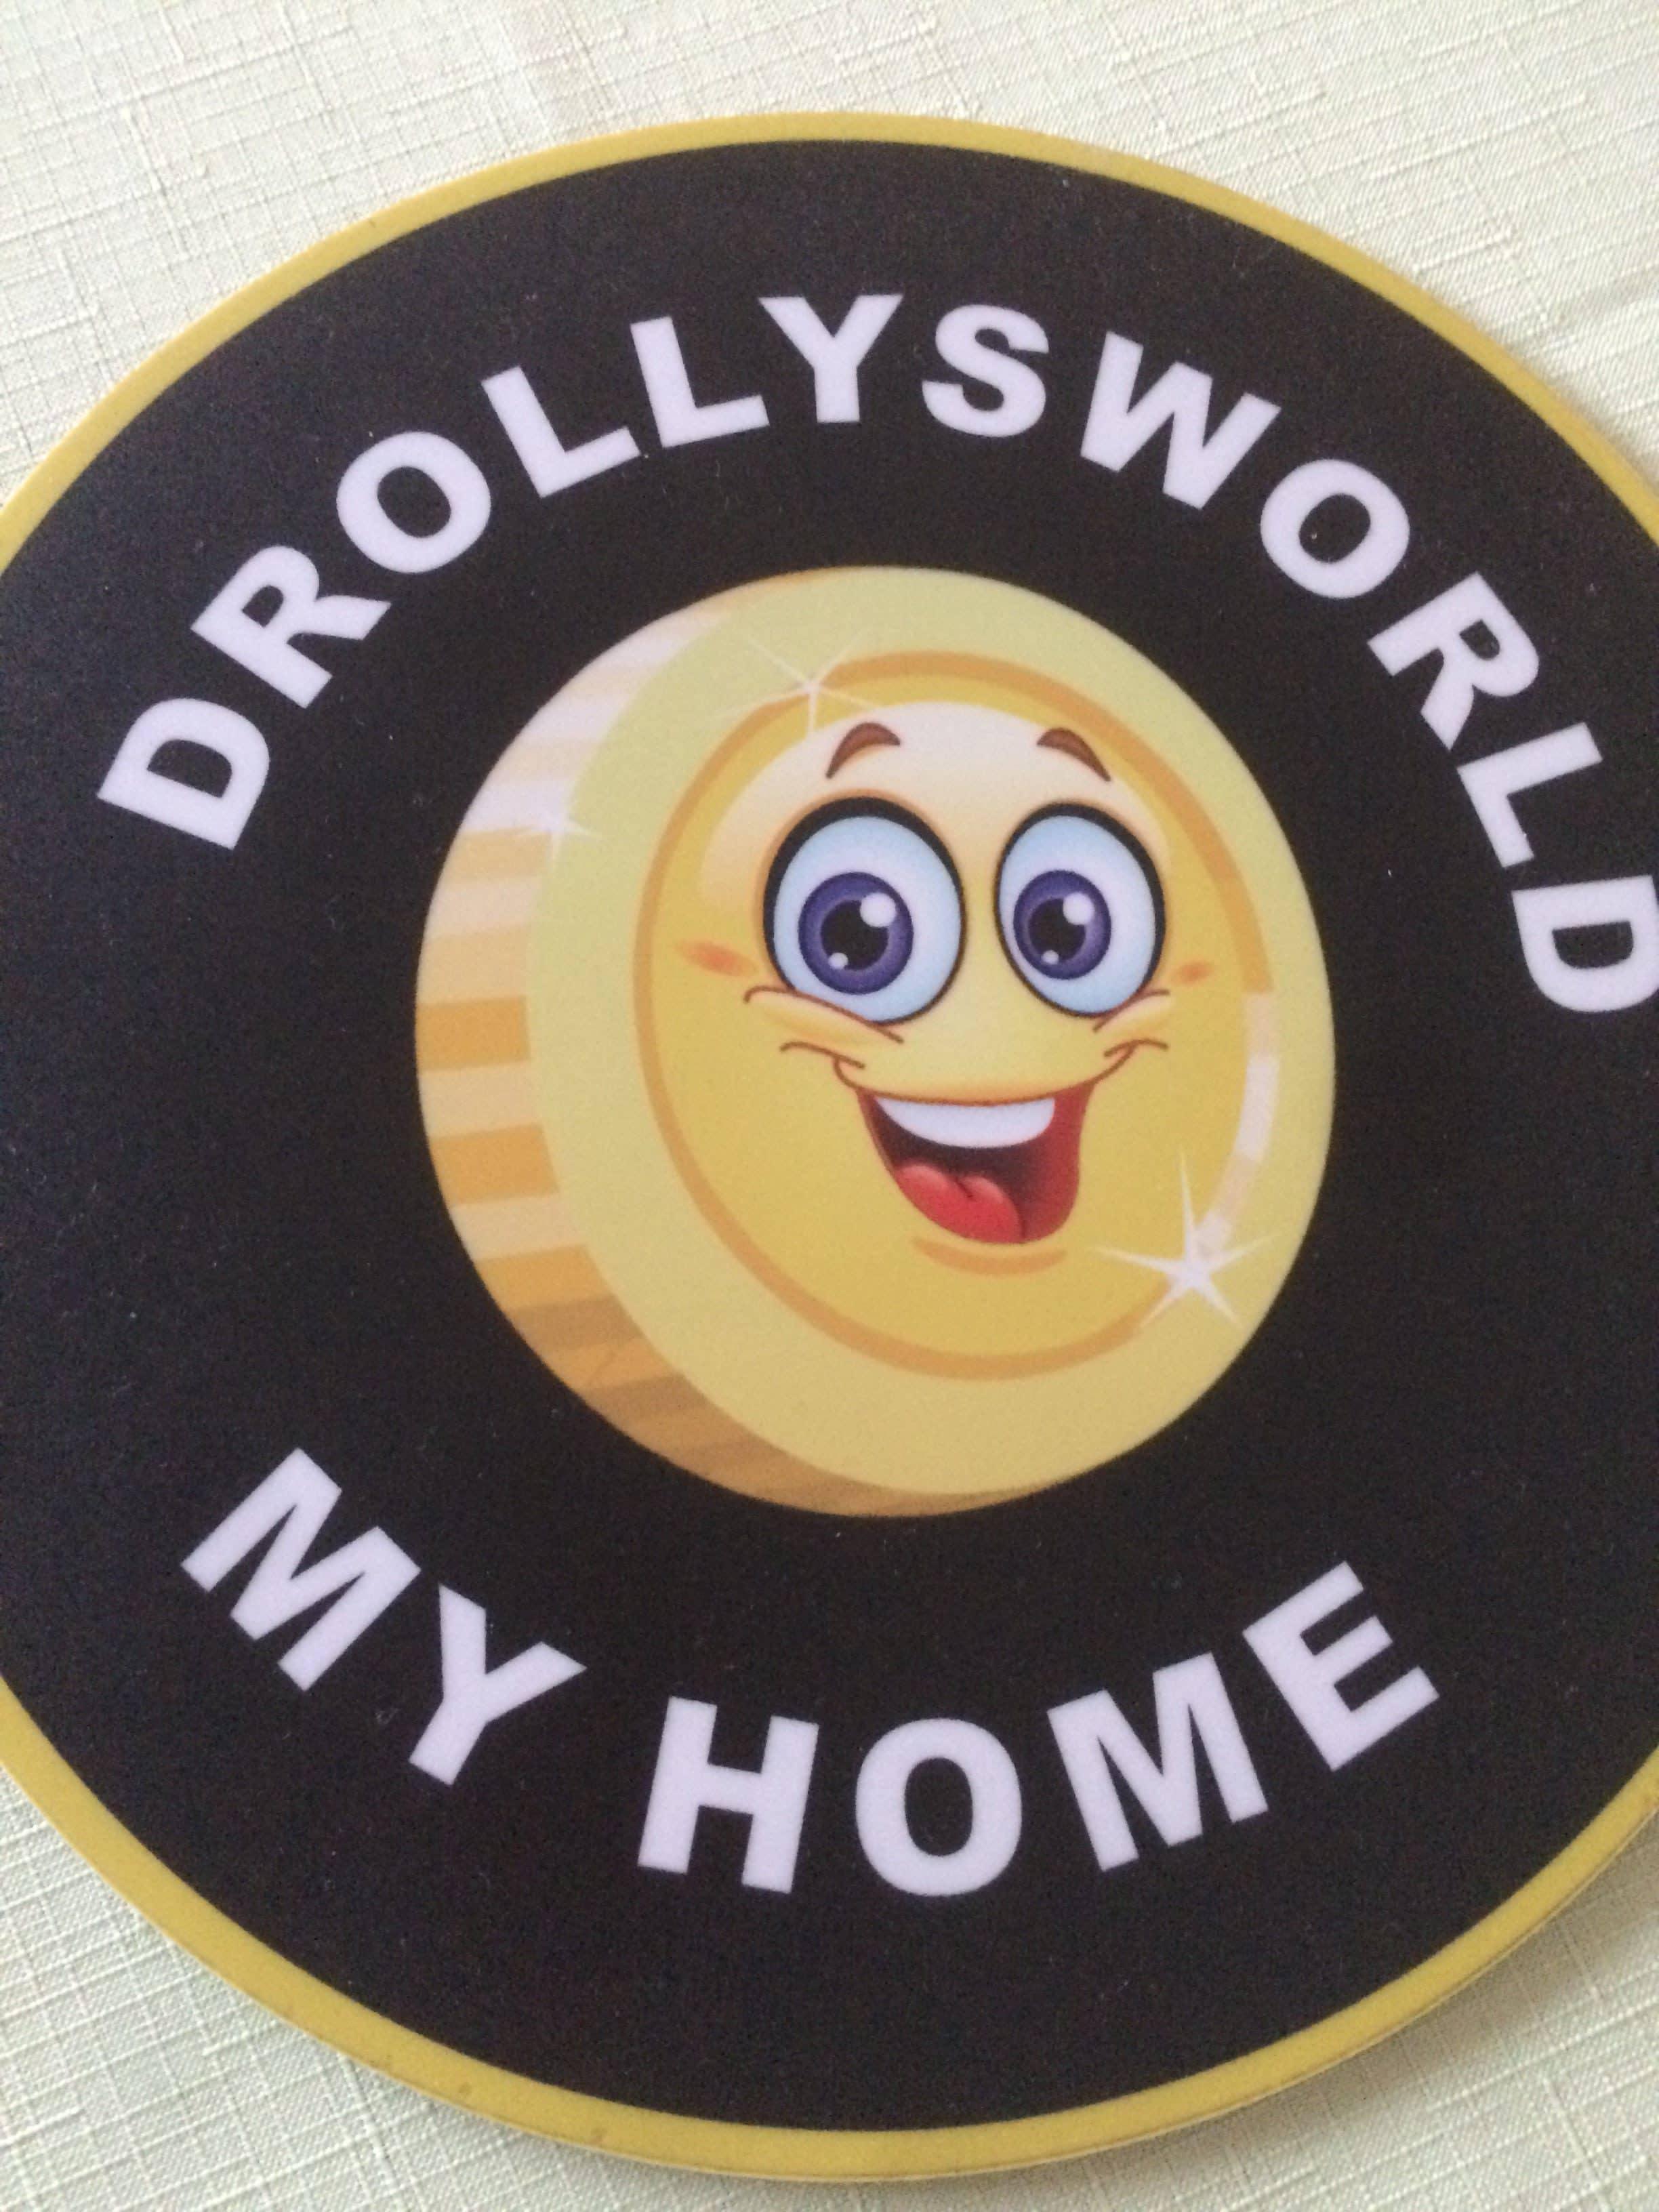 Drollysworld